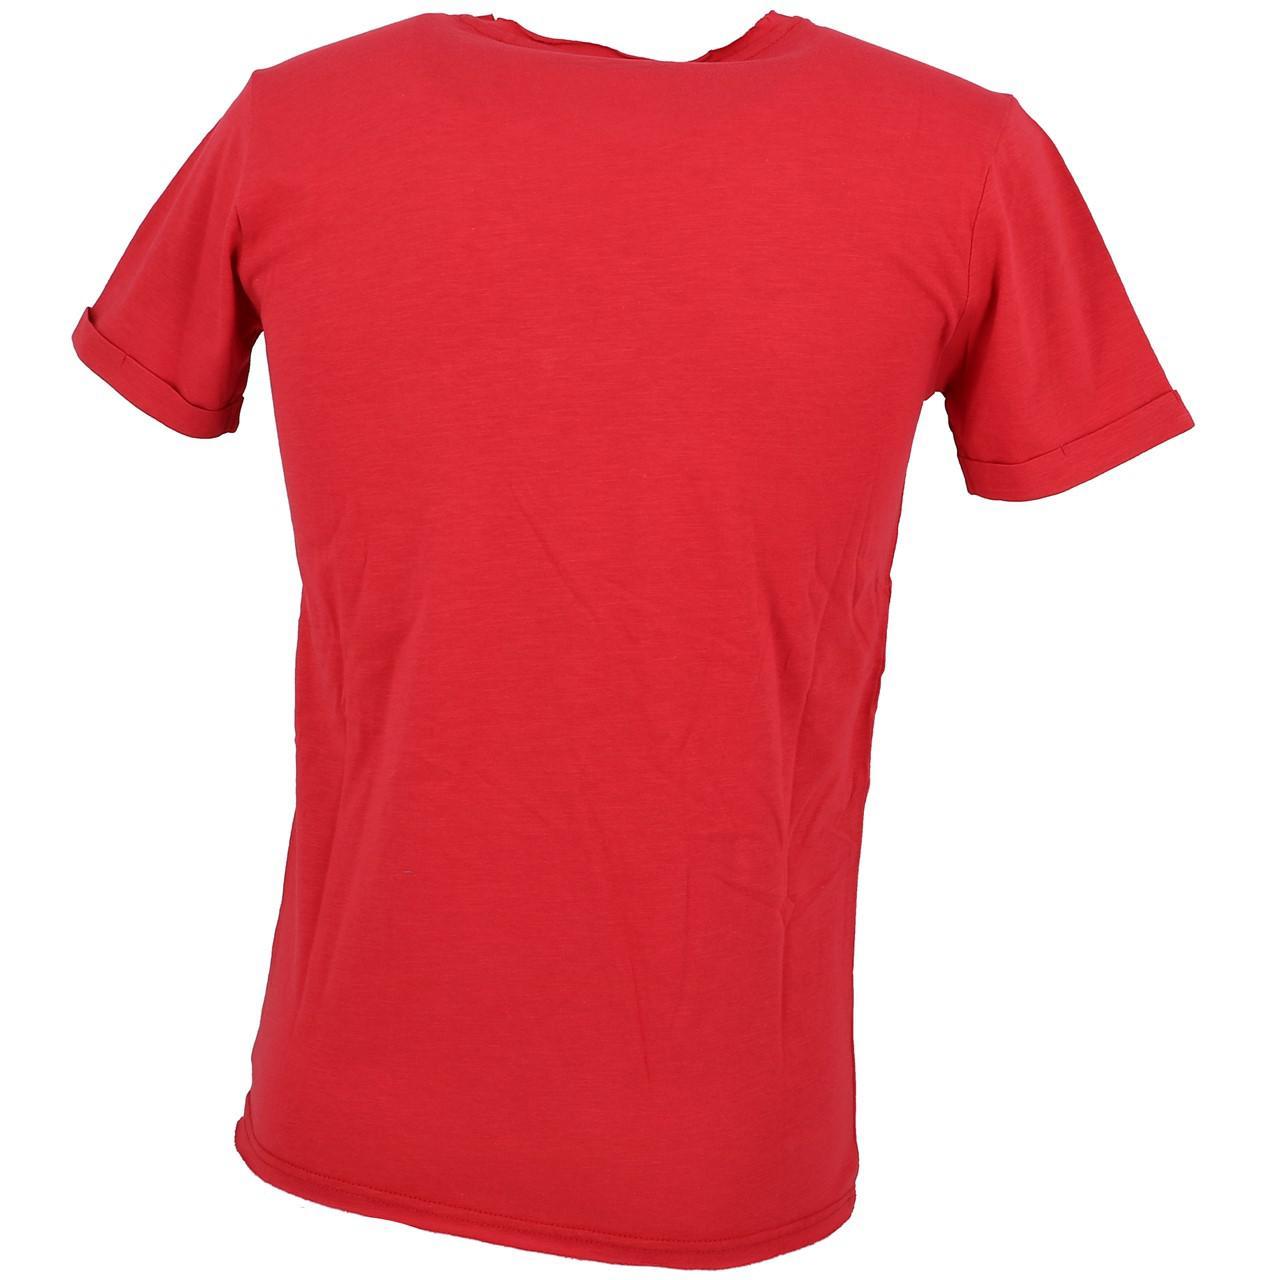 Short-Teddy-smith-Turos-Red-Mc-Tee-Red-30023-New thumbnail 5